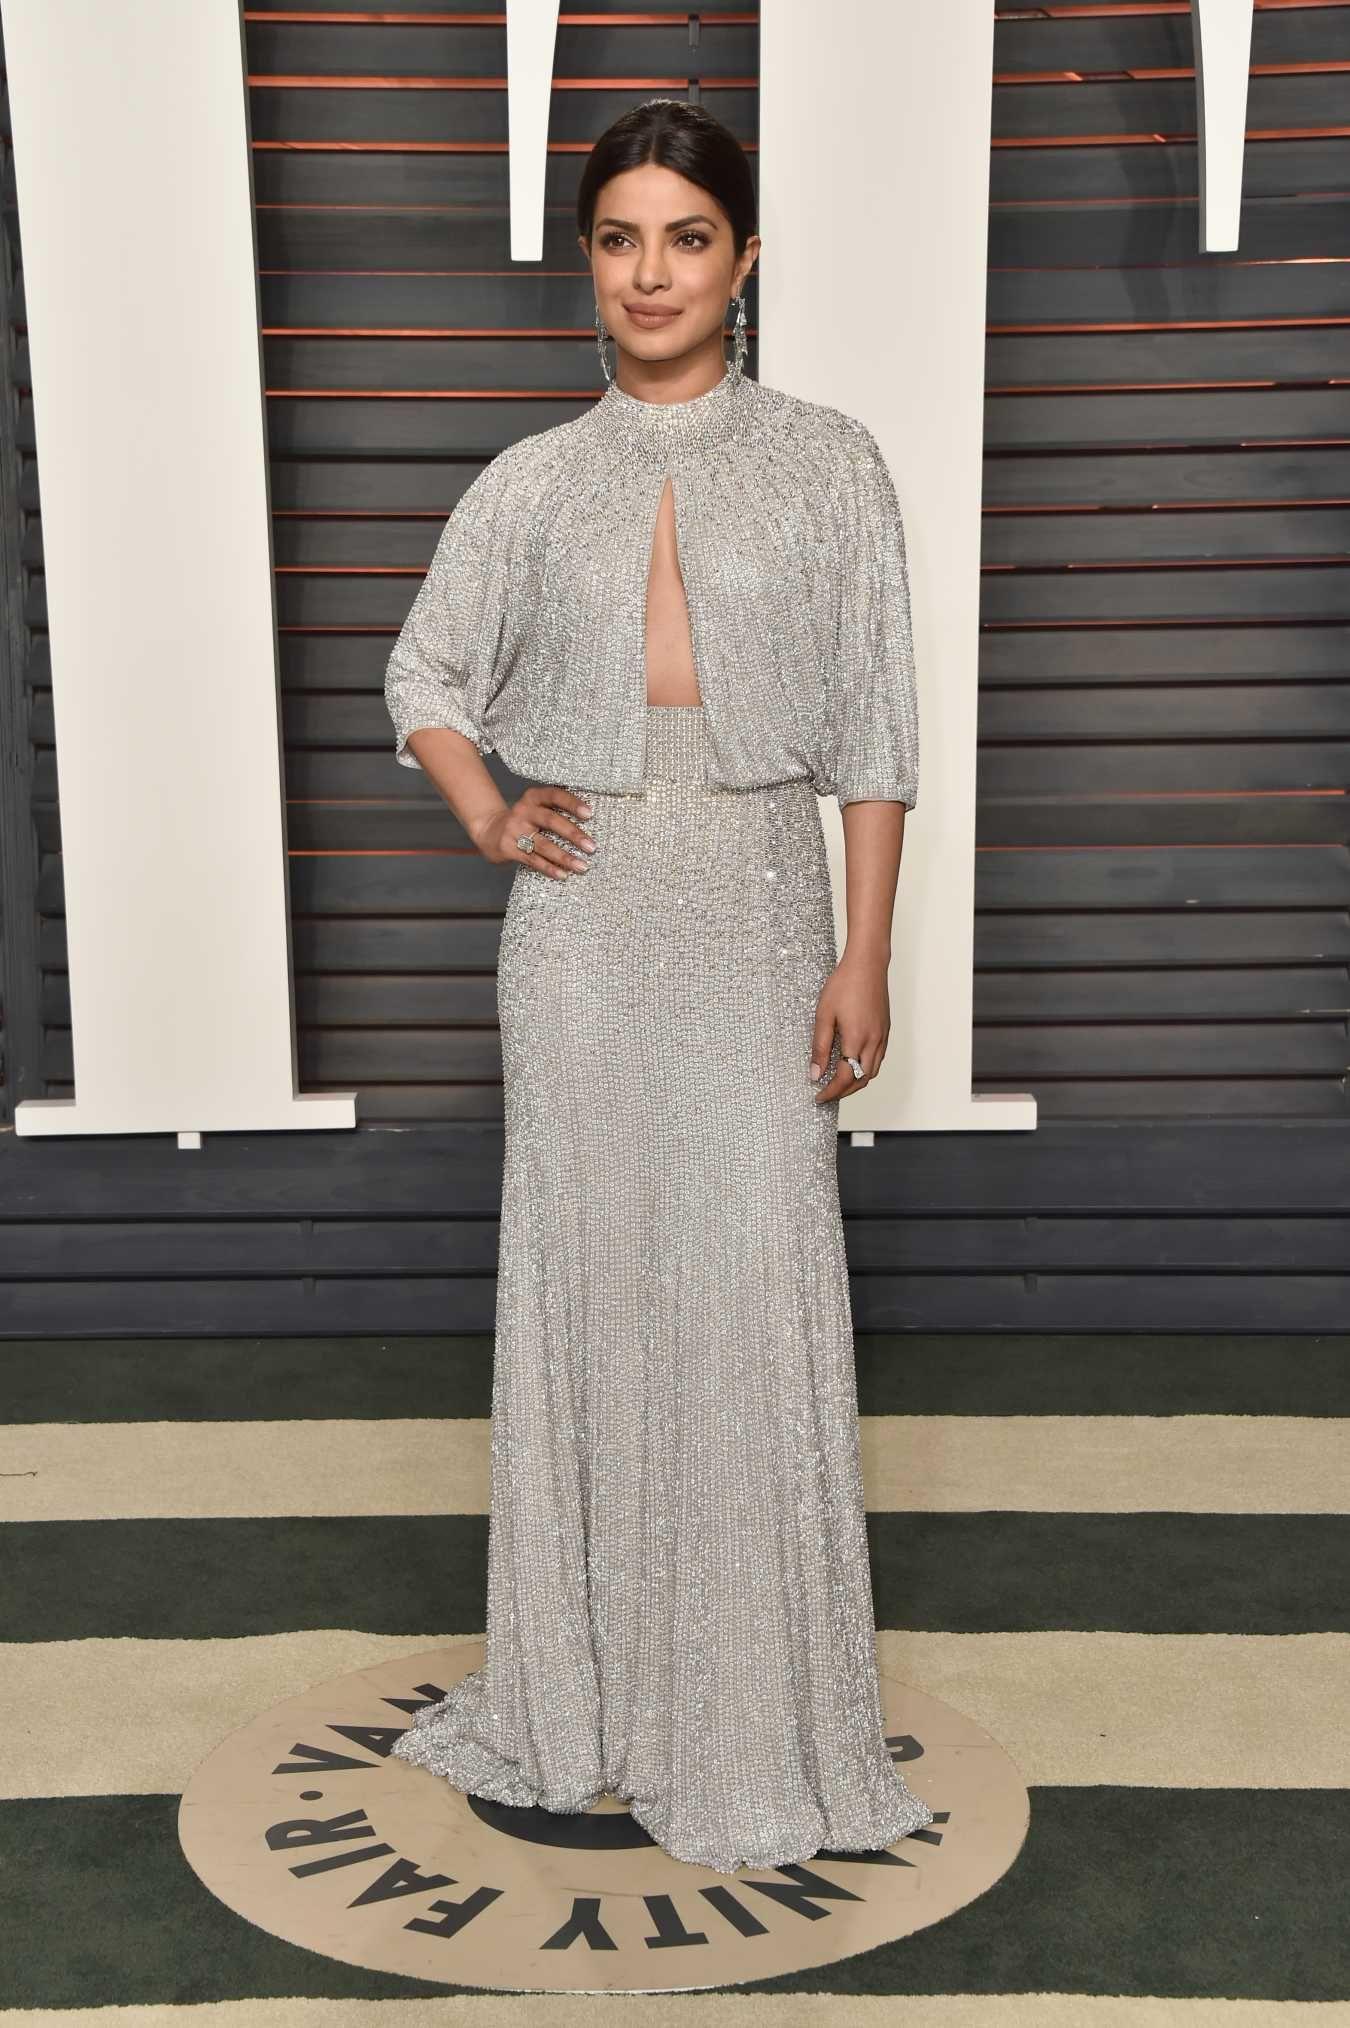 581a5bc9a30ce Priyanka Chopra at the 2016 Vanity Fair Oscar Party. Photo: Pascal Le  Segretain/Getty Images.